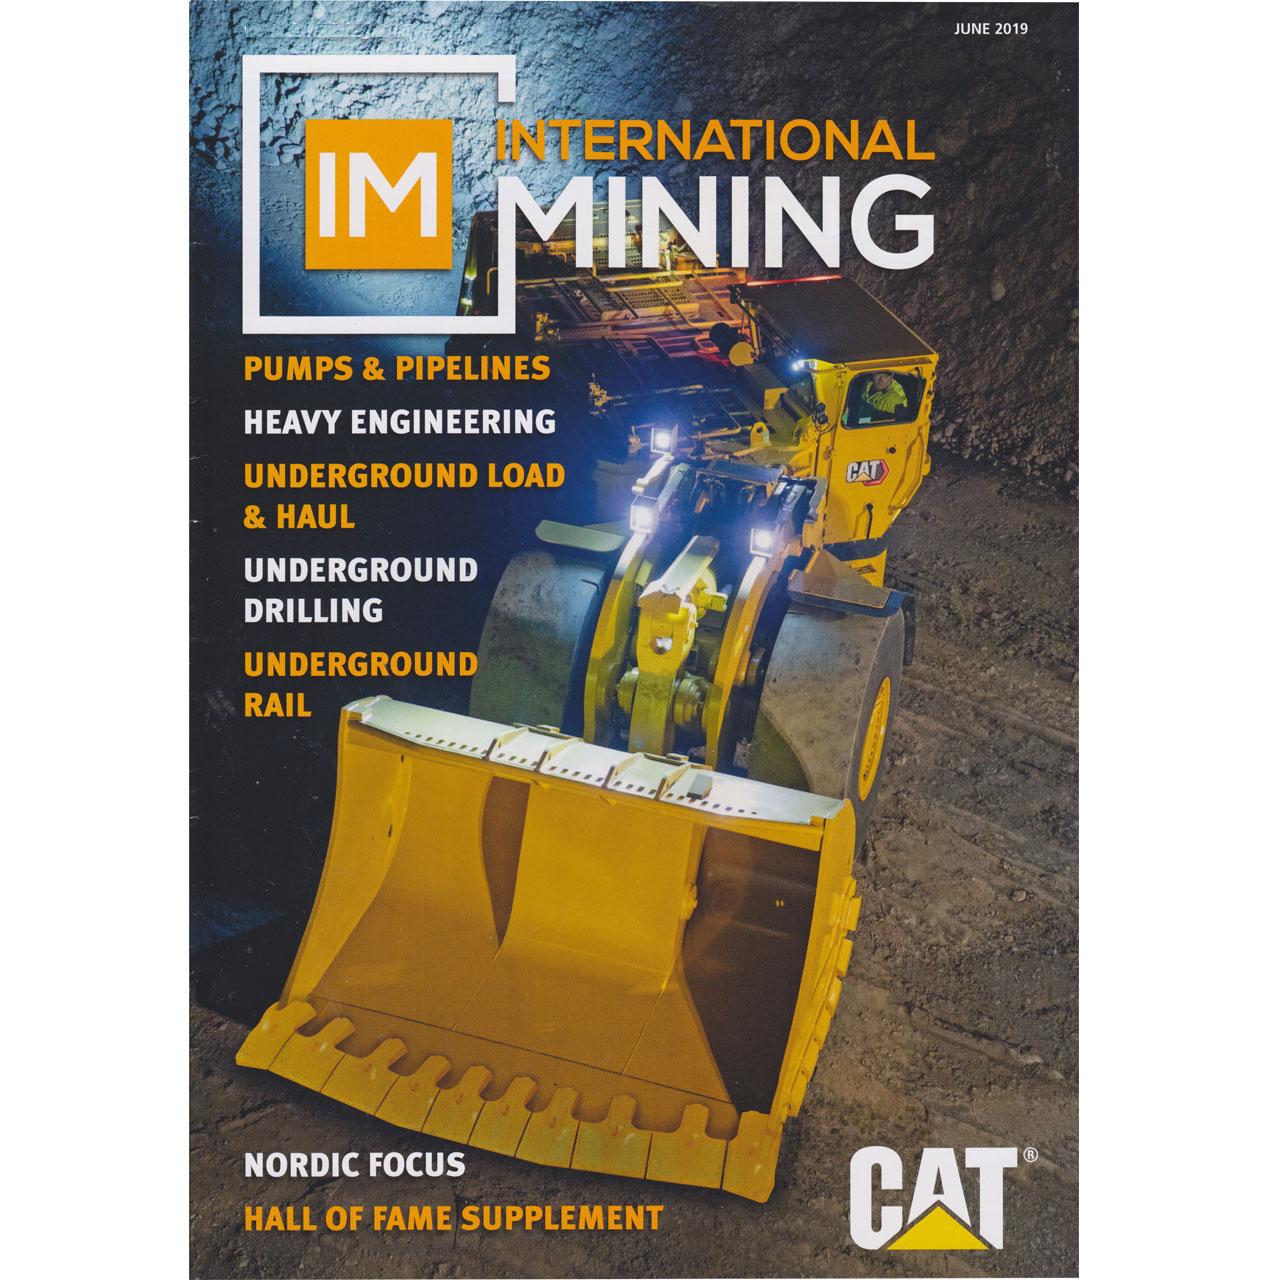 مجله International Mining ژوئن 2019